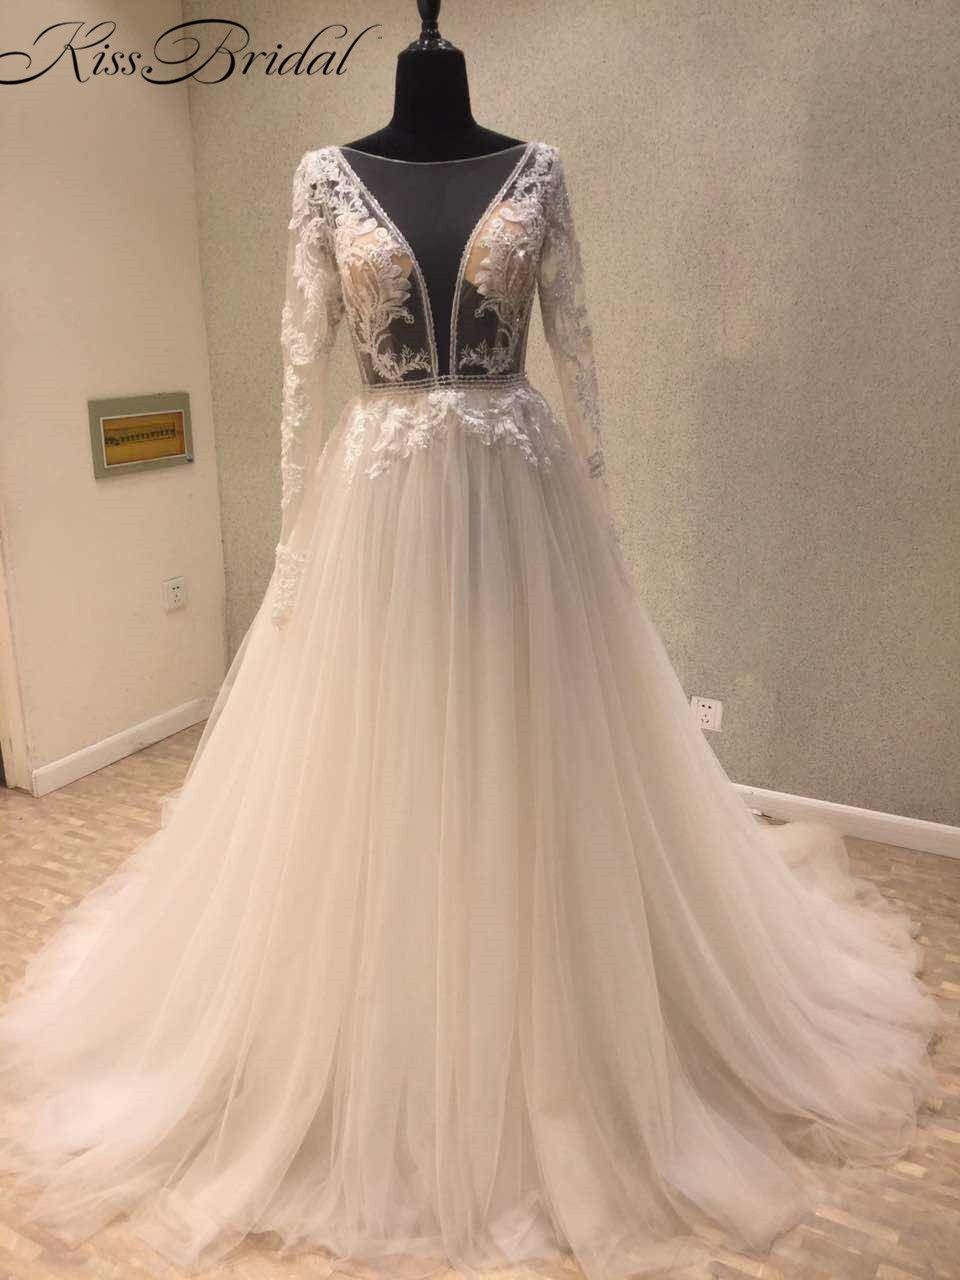 New elegant aline wedding dresses tulle backless illusion neckline